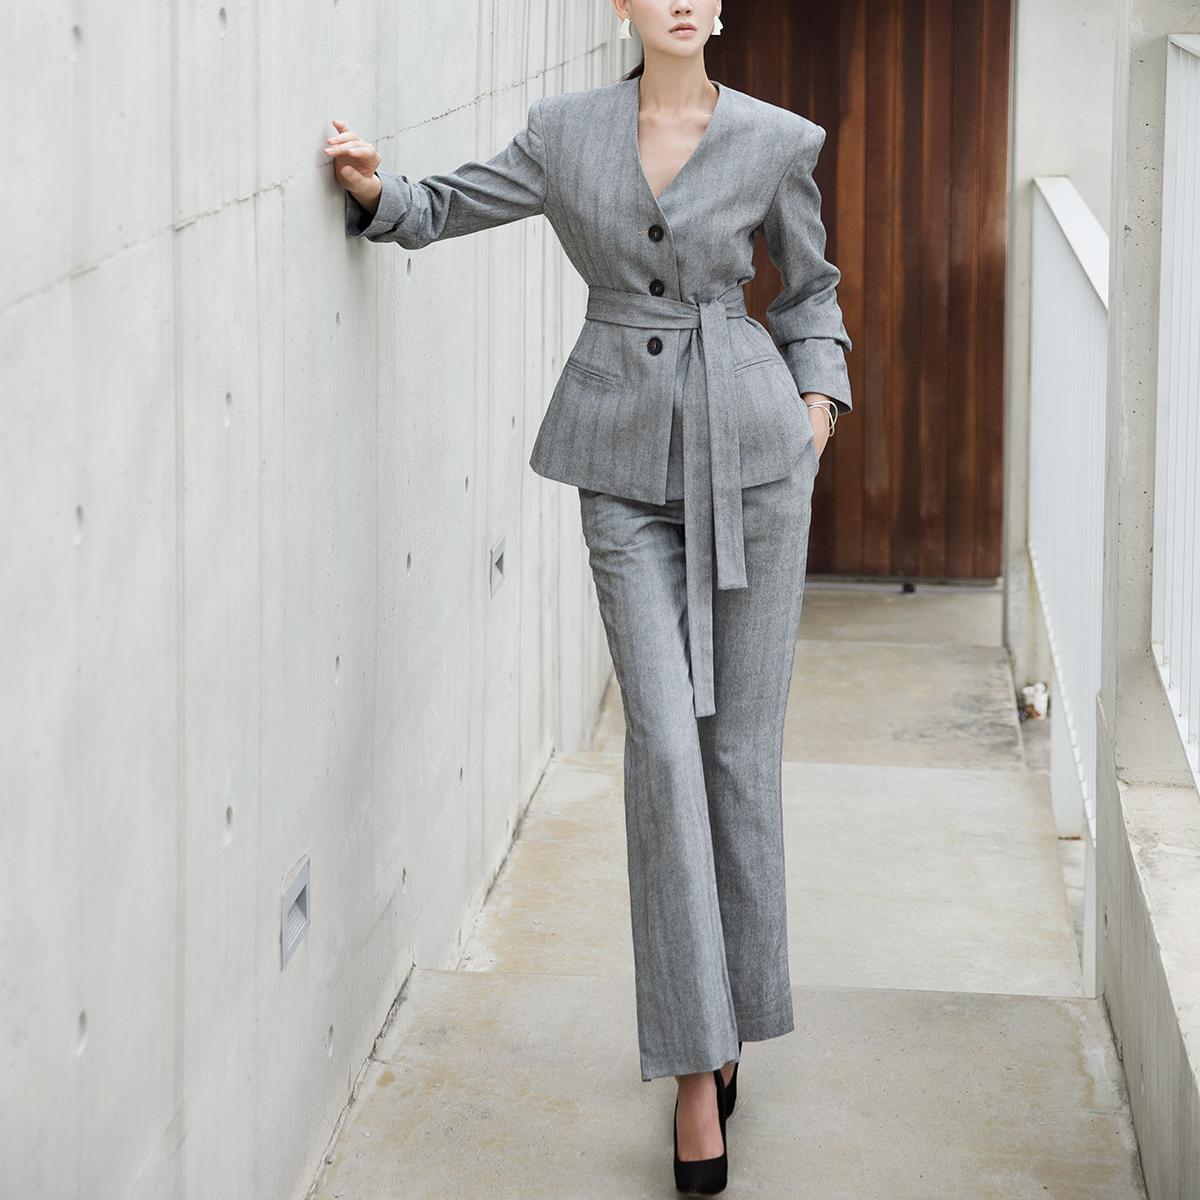 Korean TP1005 No-collar Herringbone Line Setup Suit (JACKETBelt set)